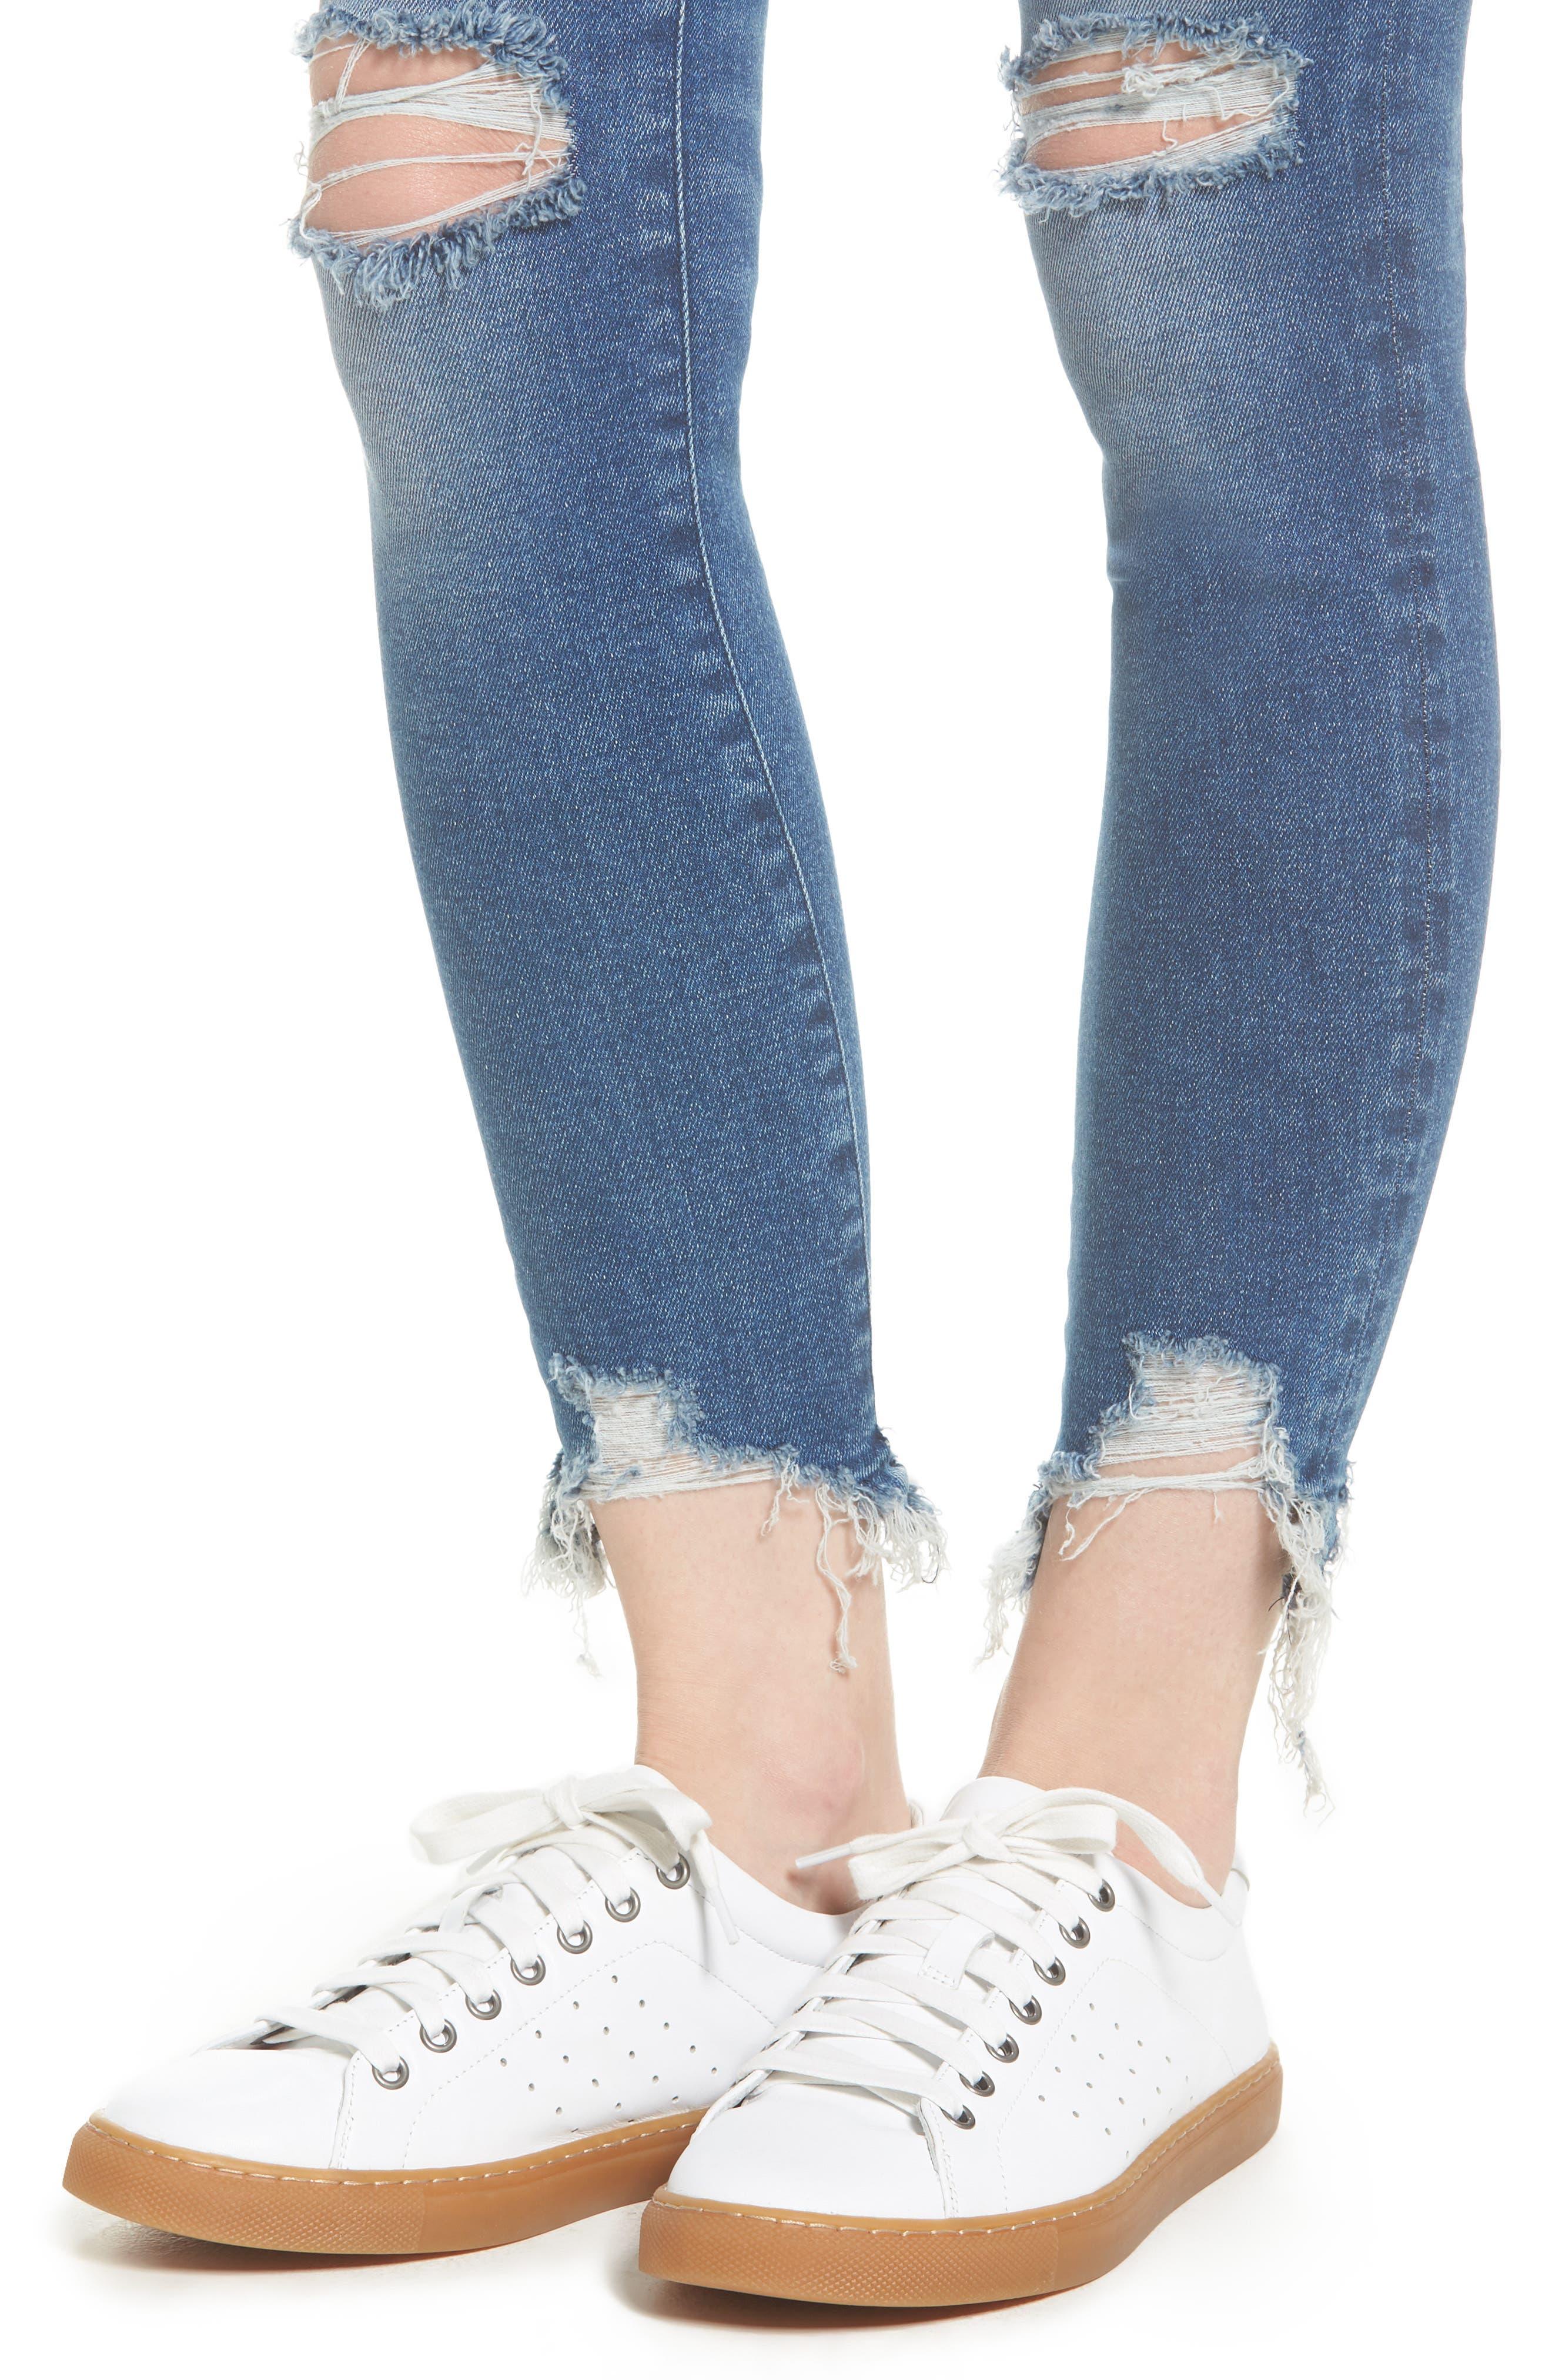 Farrow Instaslim High Waist Ankle Skinny Jeans,                             Alternate thumbnail 4, color,                             430